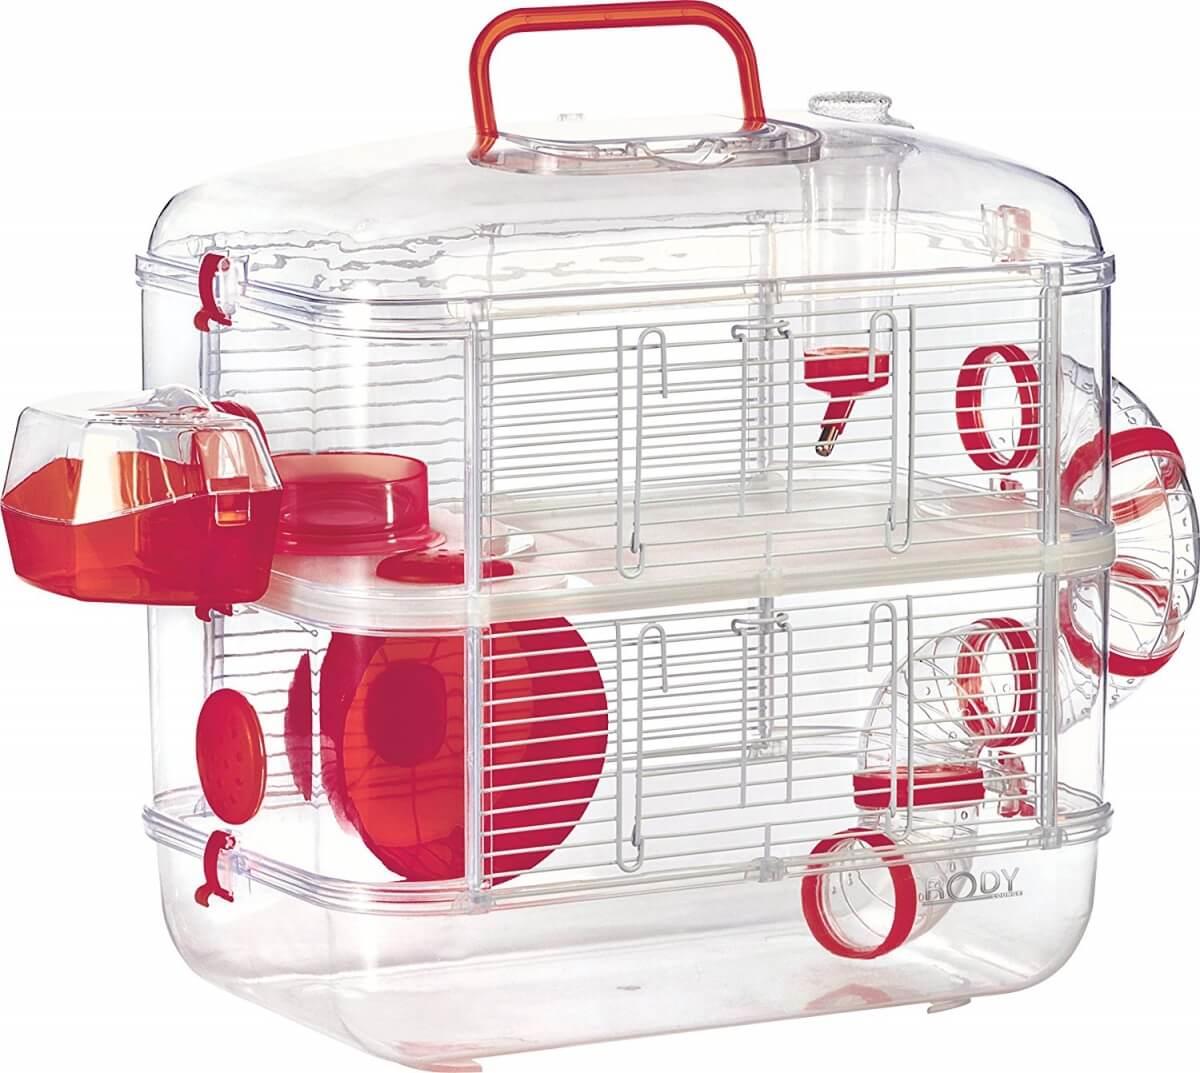 cage rodylounge duo couleur cerise pour hamster cage hamster. Black Bedroom Furniture Sets. Home Design Ideas